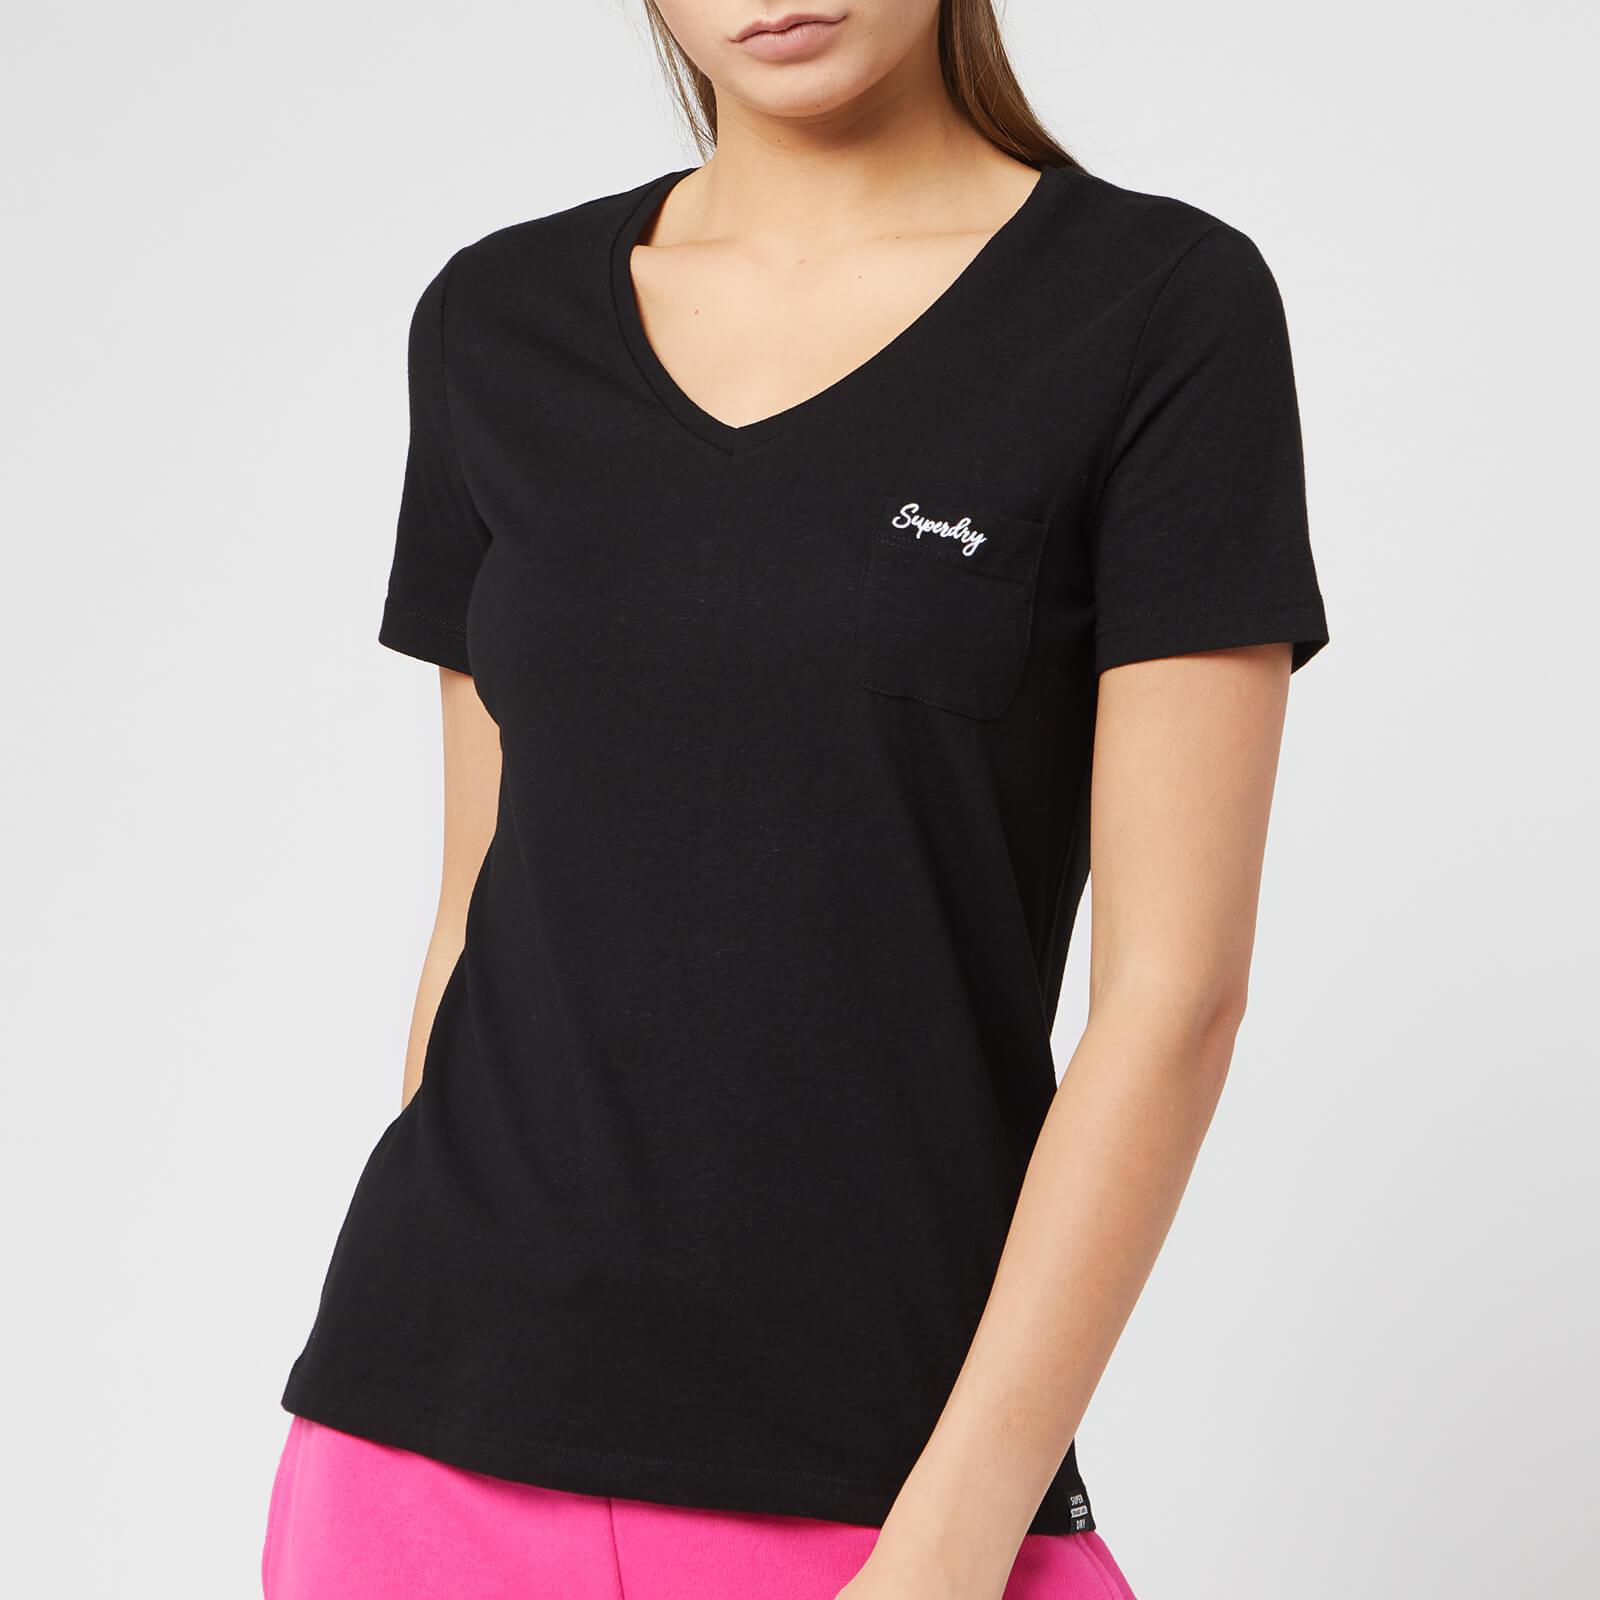 Superdry Women's Ol Essential Vee T-Shirt - Jet Black - UK 14 - Black